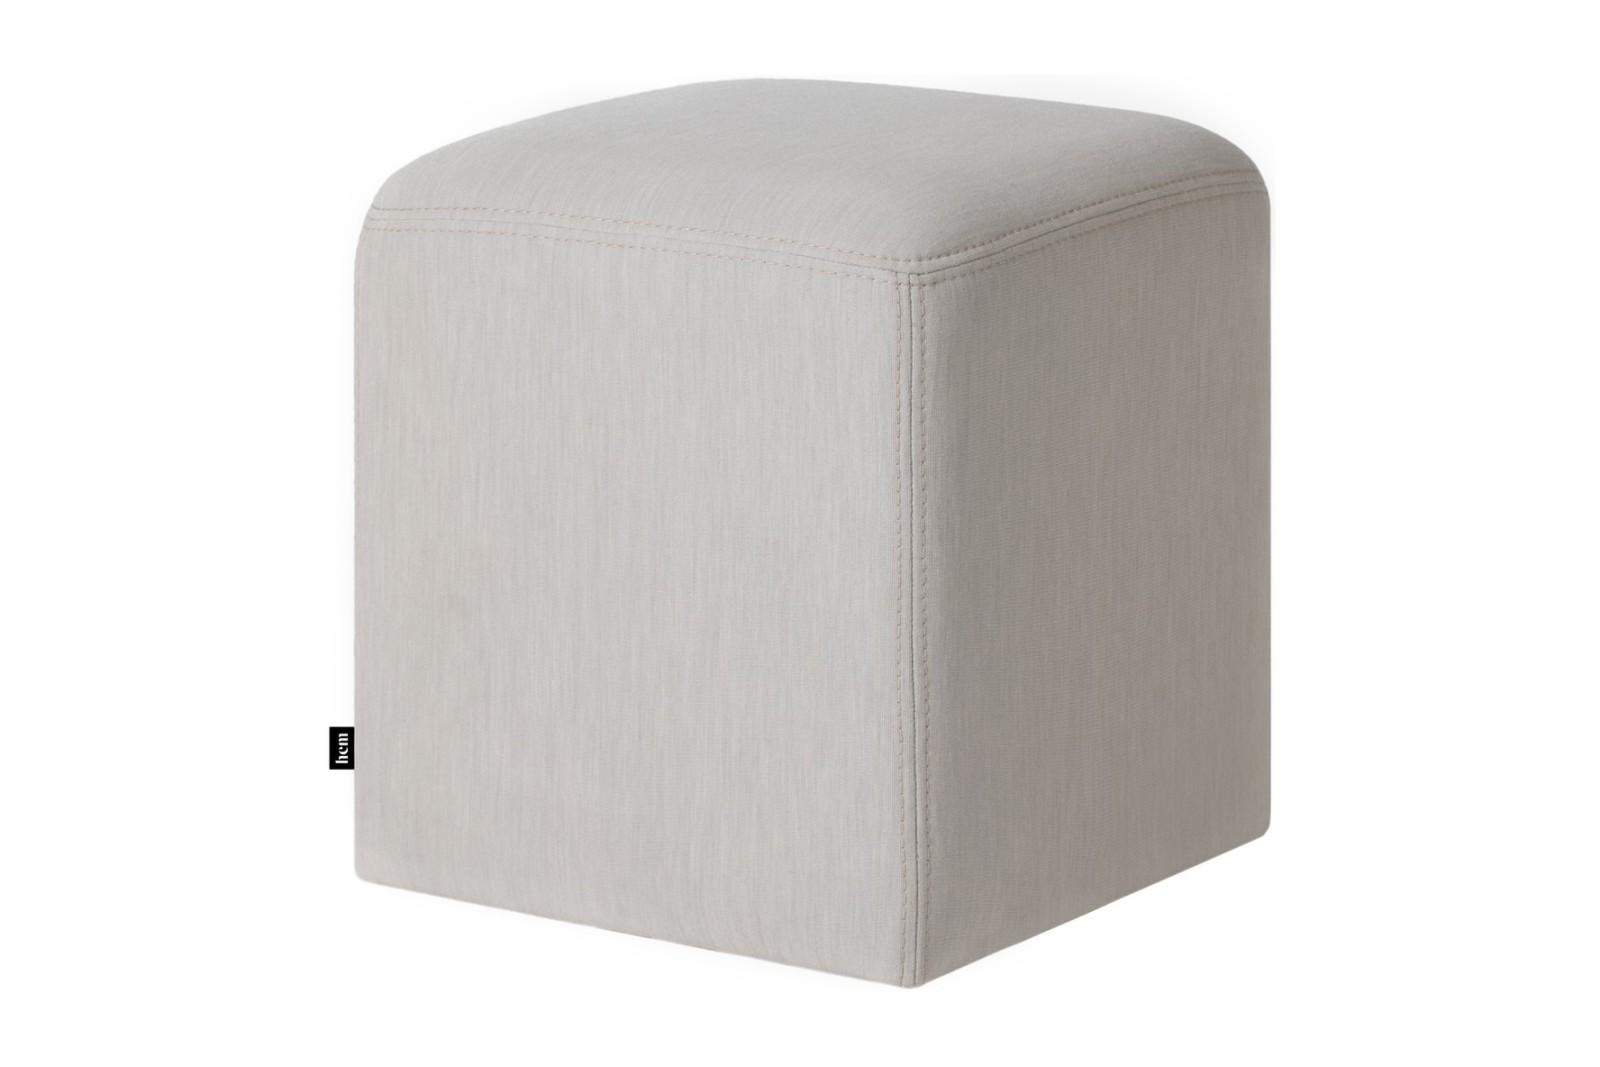 Bon Pouf Cube Uniform Melange Shell